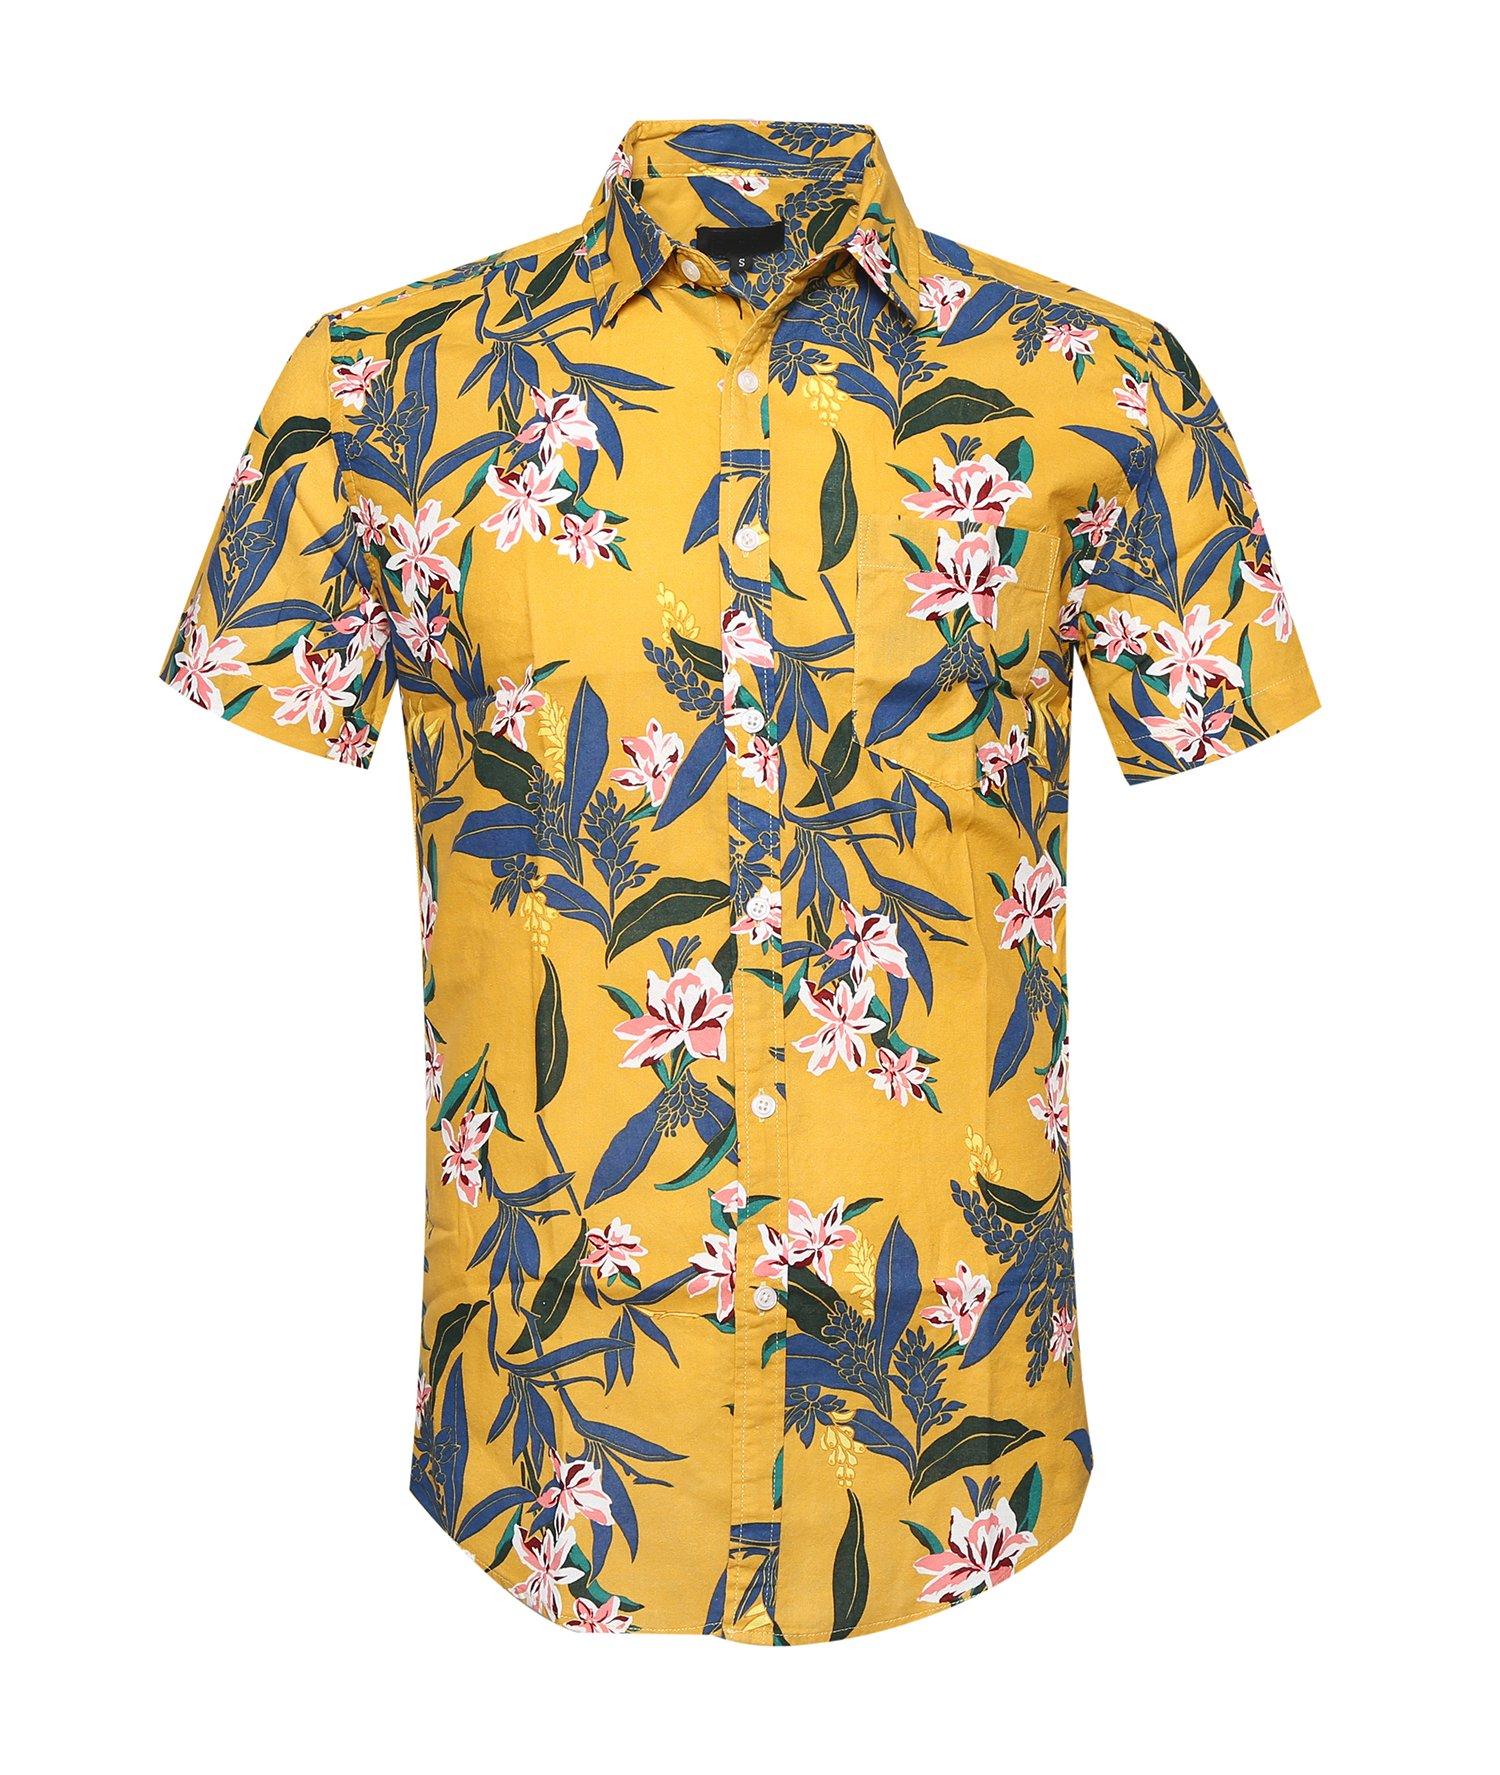 ALTOGUSTO Men's Flower Print Casual Button Down Short Sleeve Shirt Hawaiian Shirts